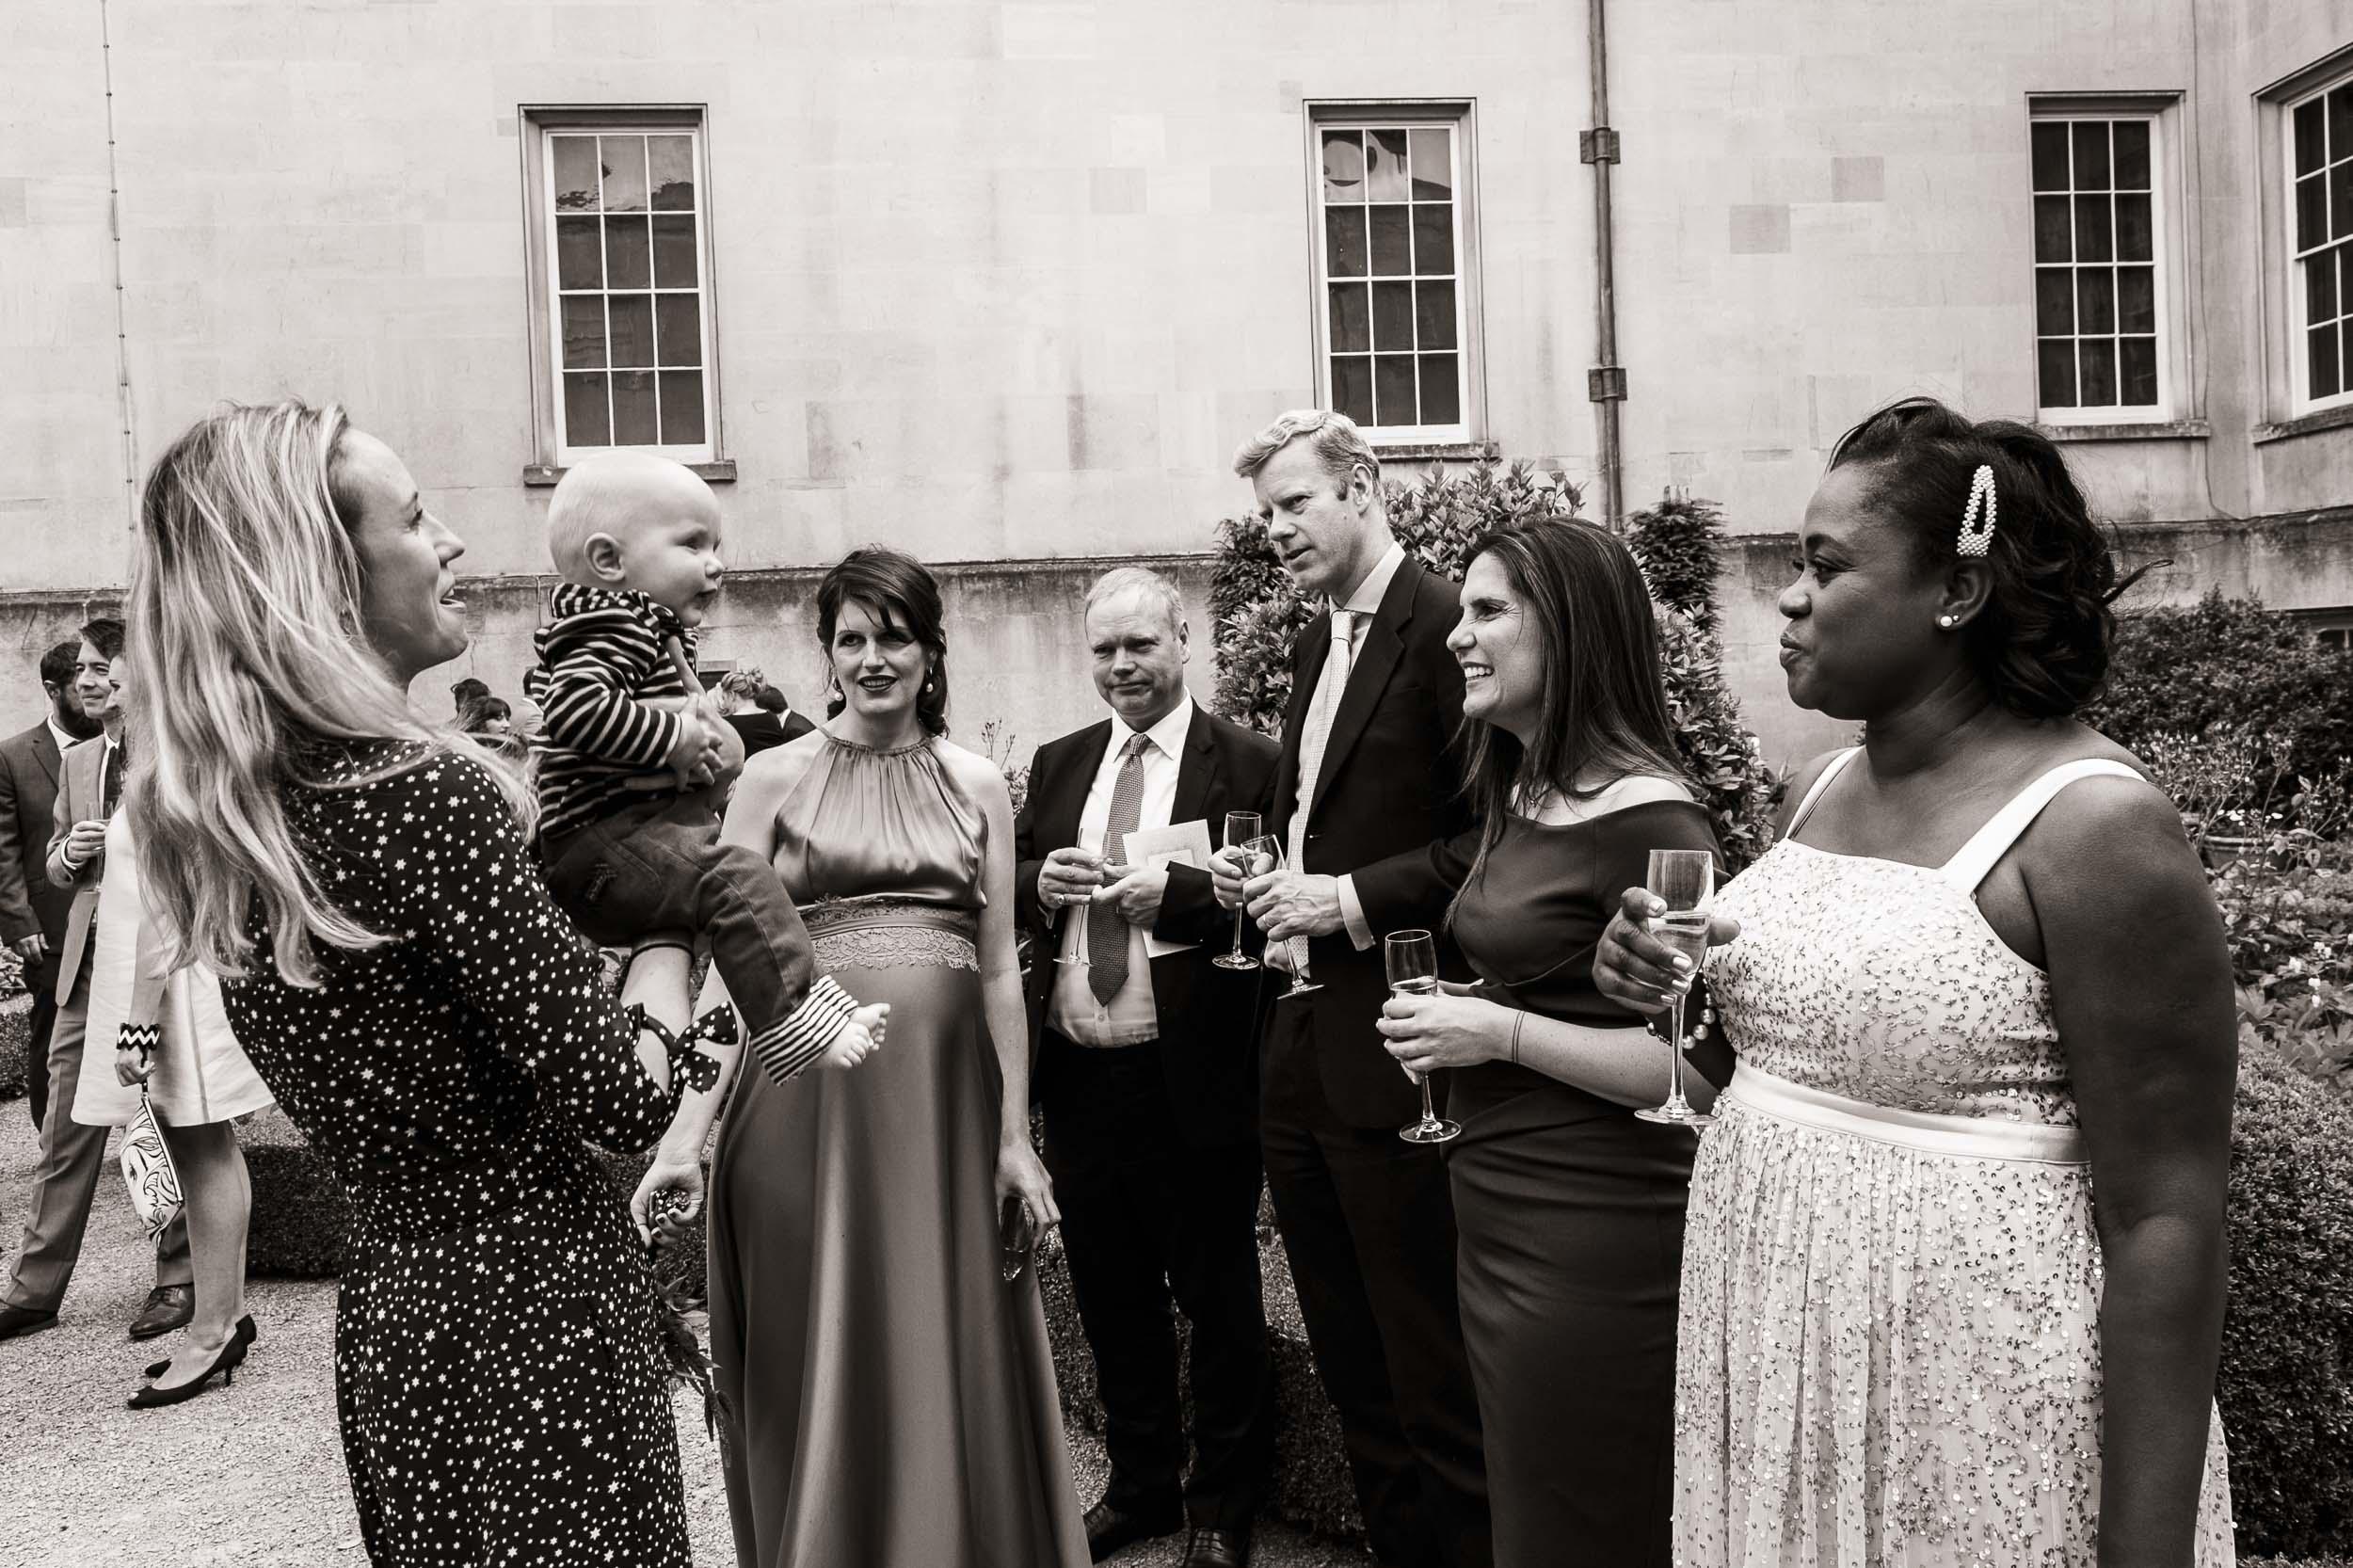 syon-house-wedding-photographer-london 087.jpg